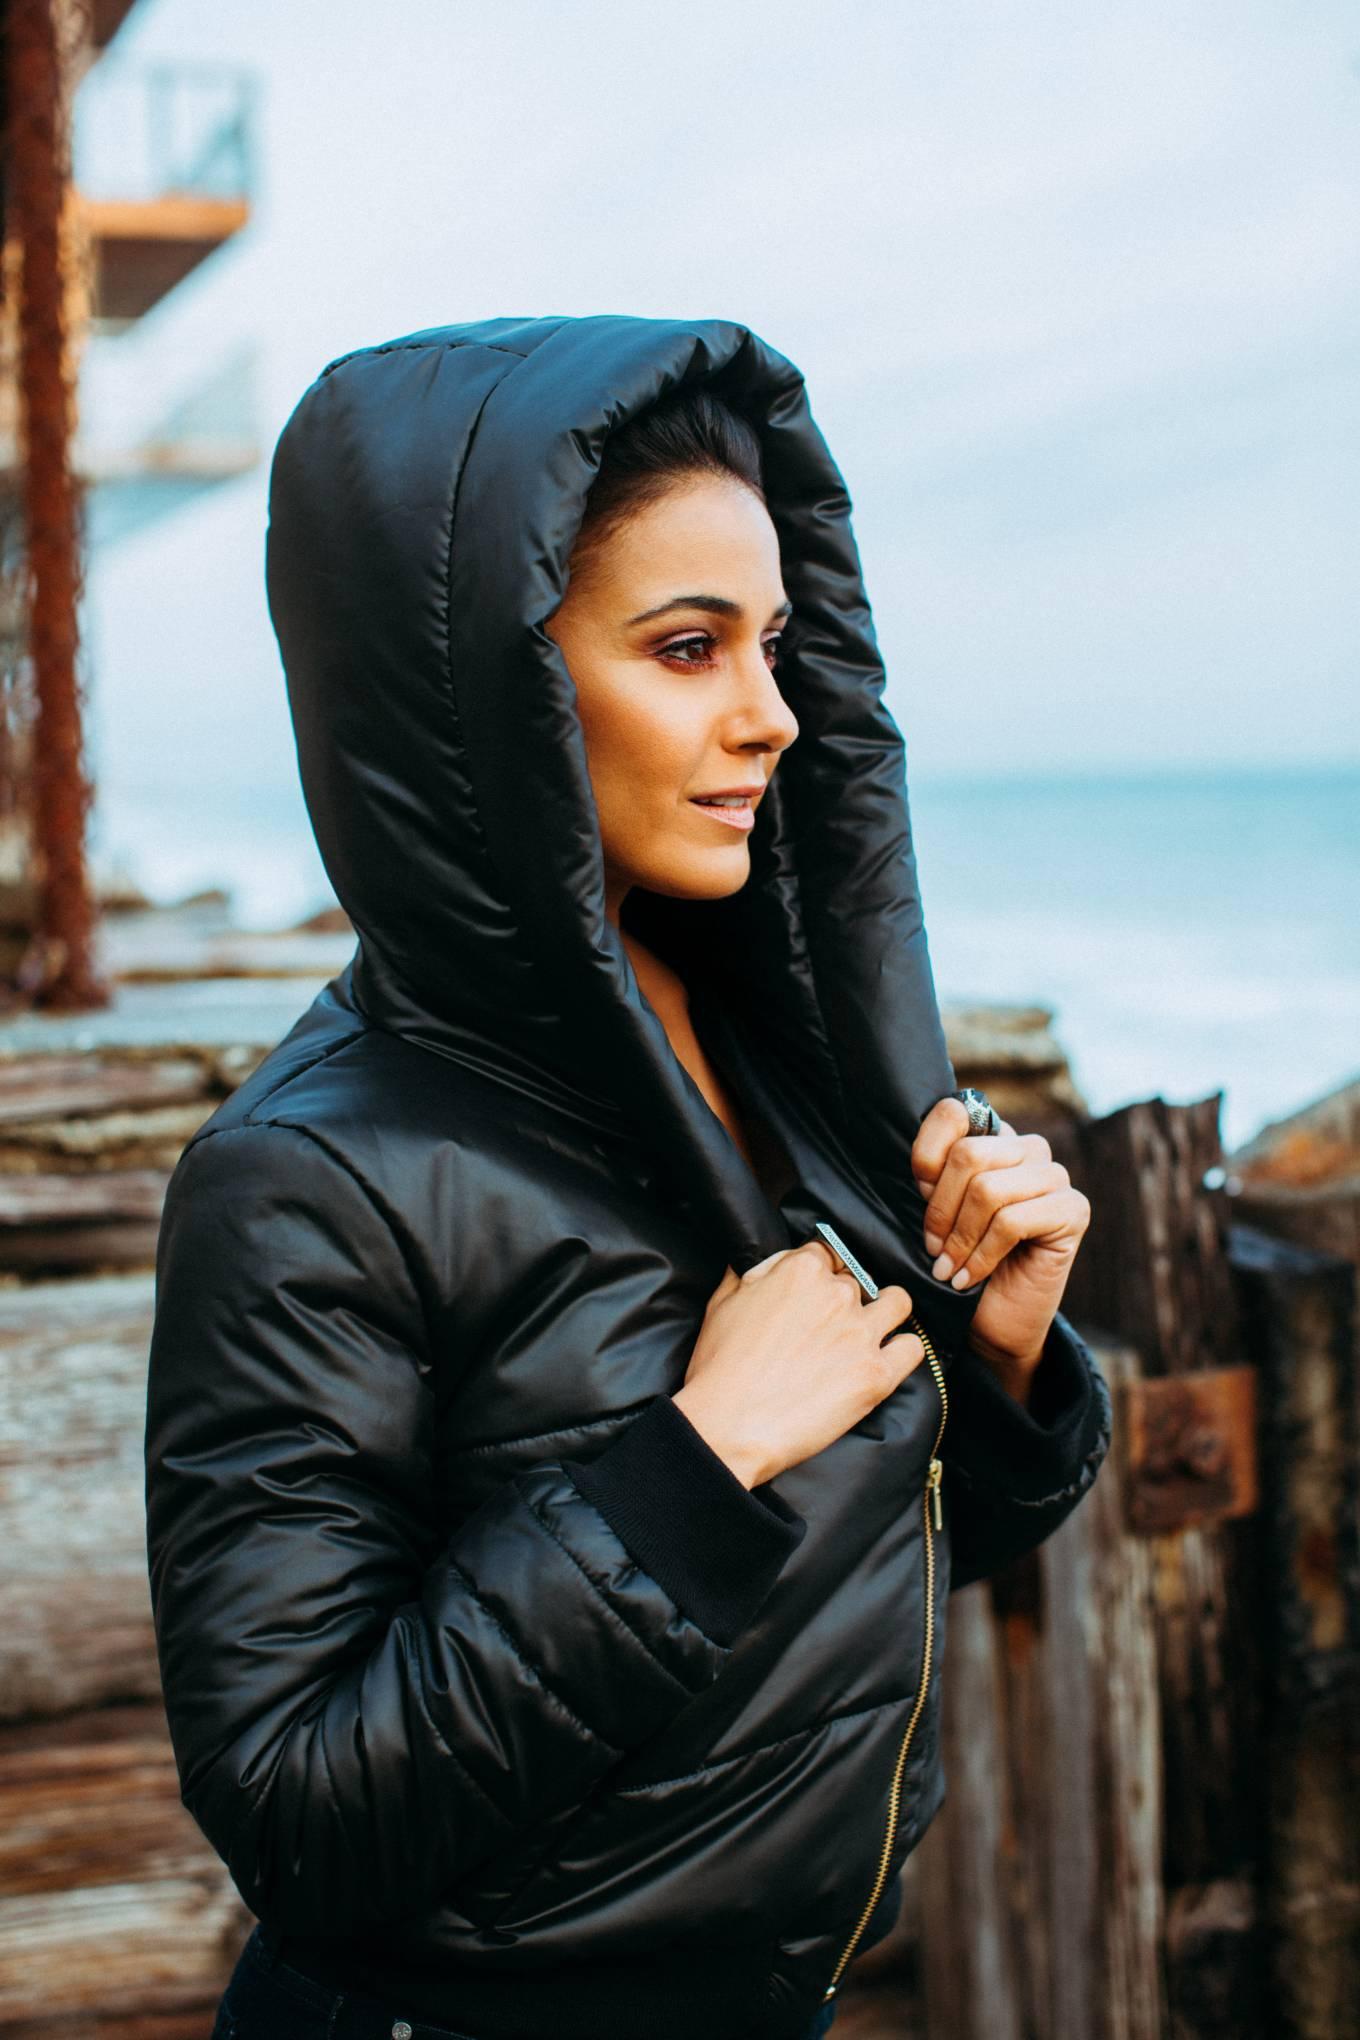 Emmanuelle Chriqui 2020 : Emmanuelle Chriqui – Nick Onken Photoshoot for Coco Eco (August 2020)-01